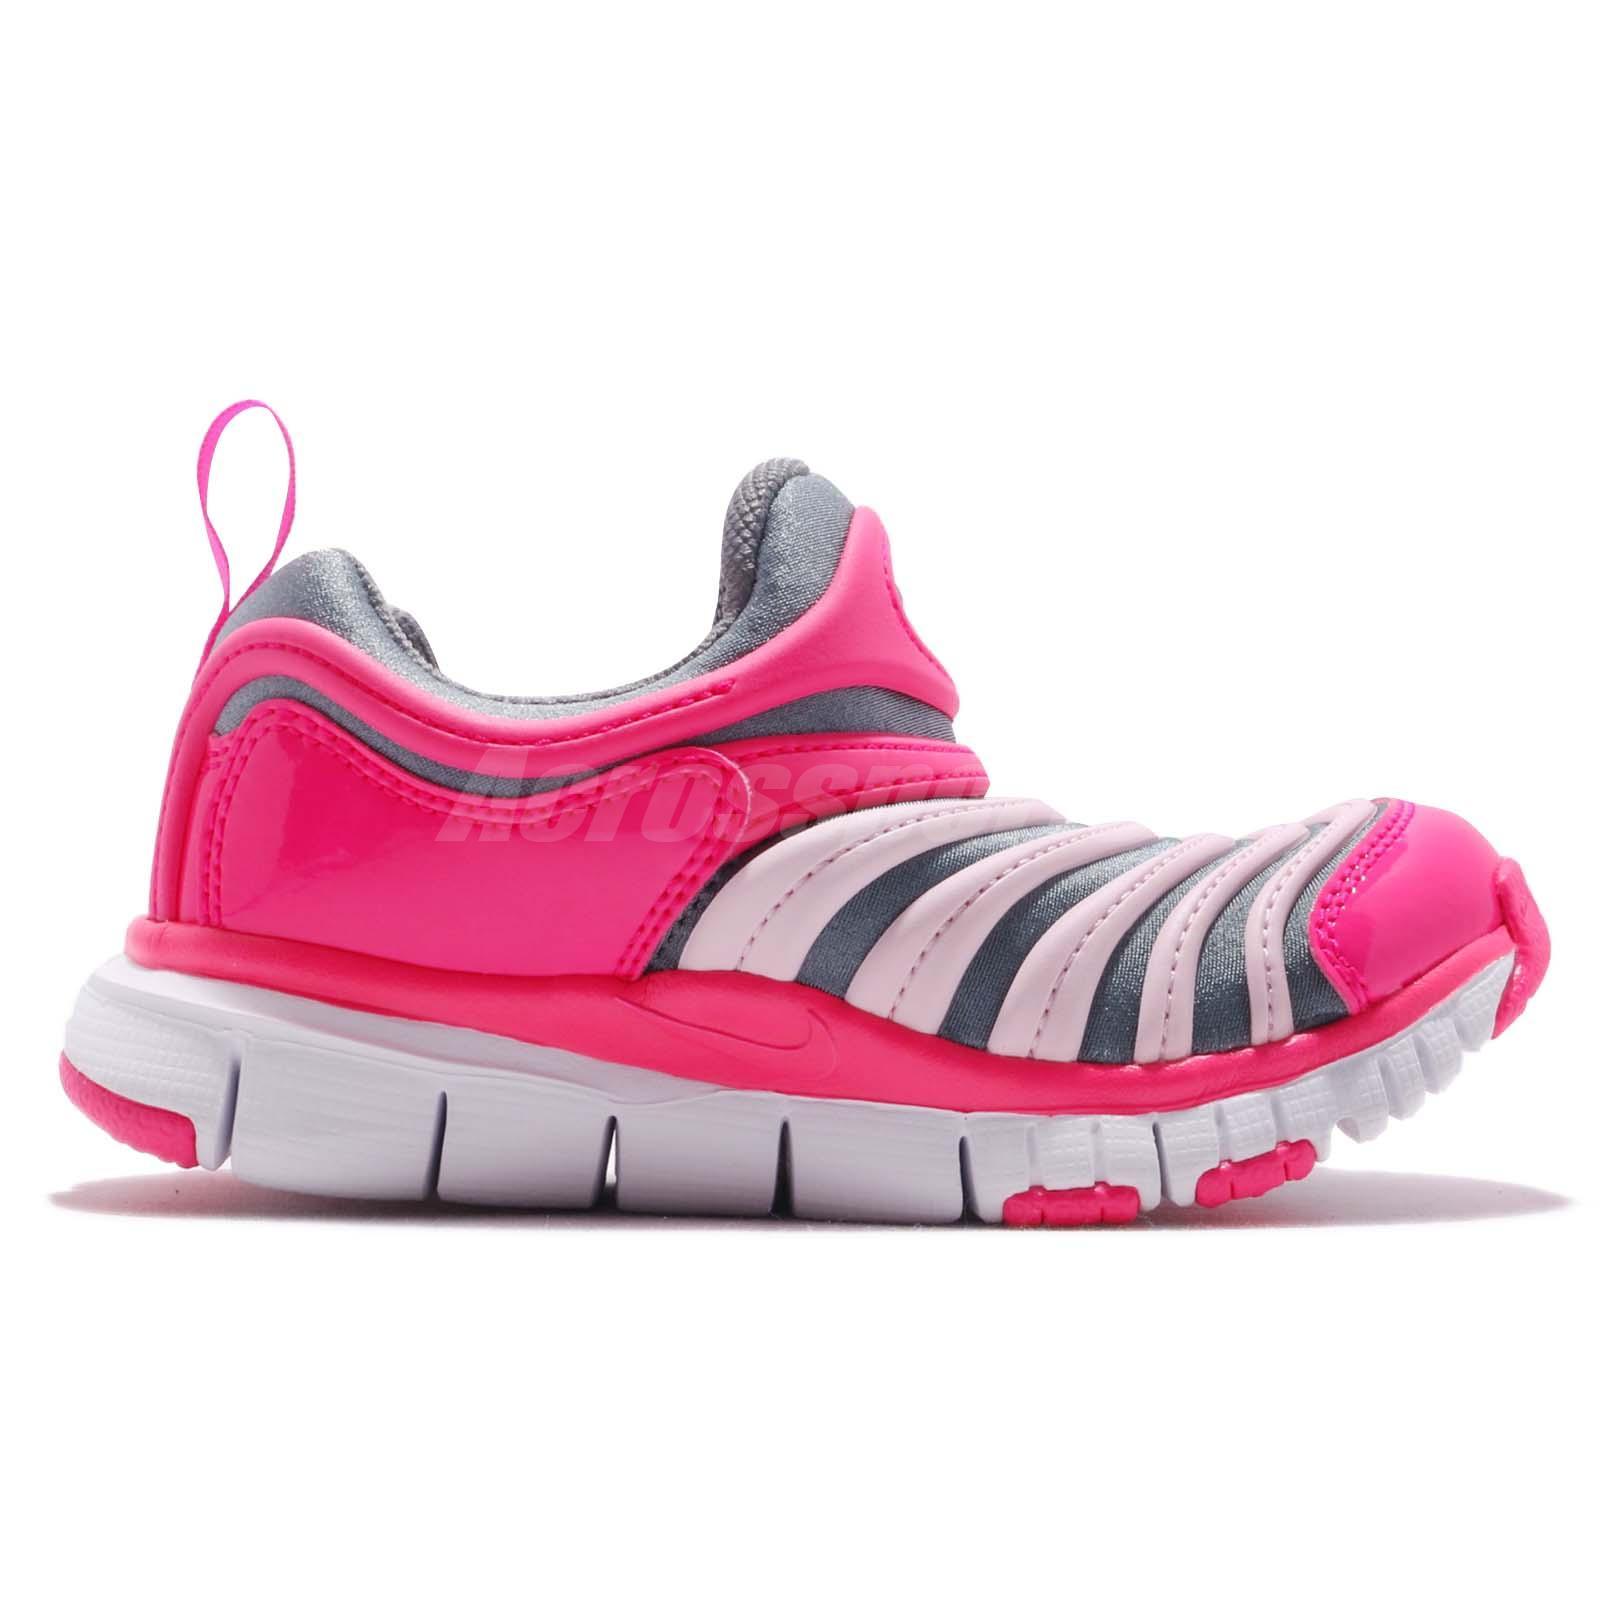 2a117206bf7fb Nike Dynamo Free PS Grey Pink White Kid Preschool Slip On Shoes ...